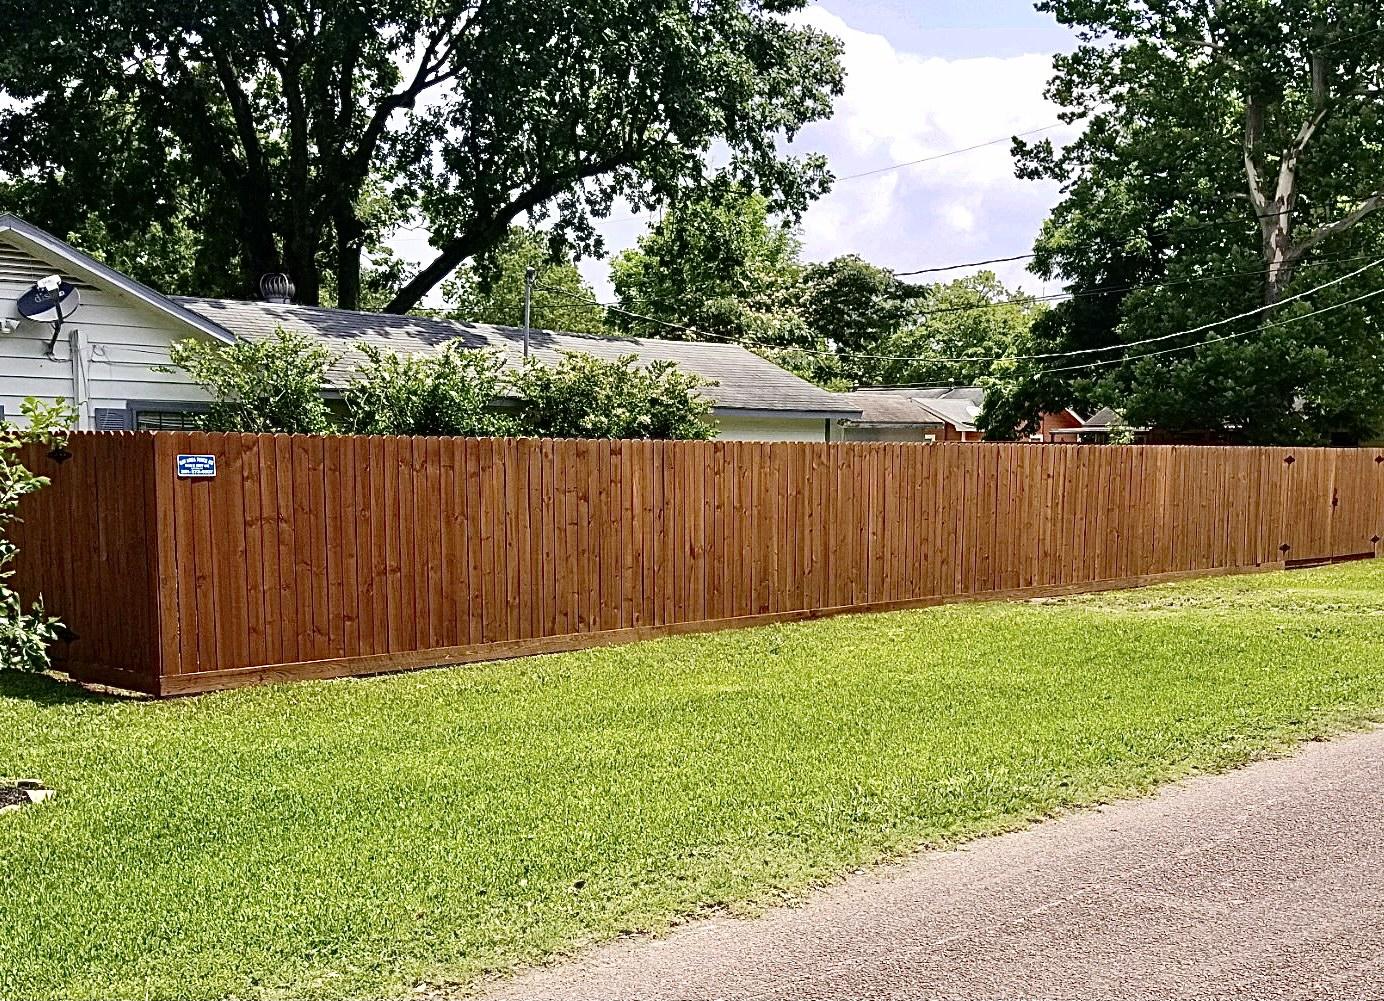 34-Fence